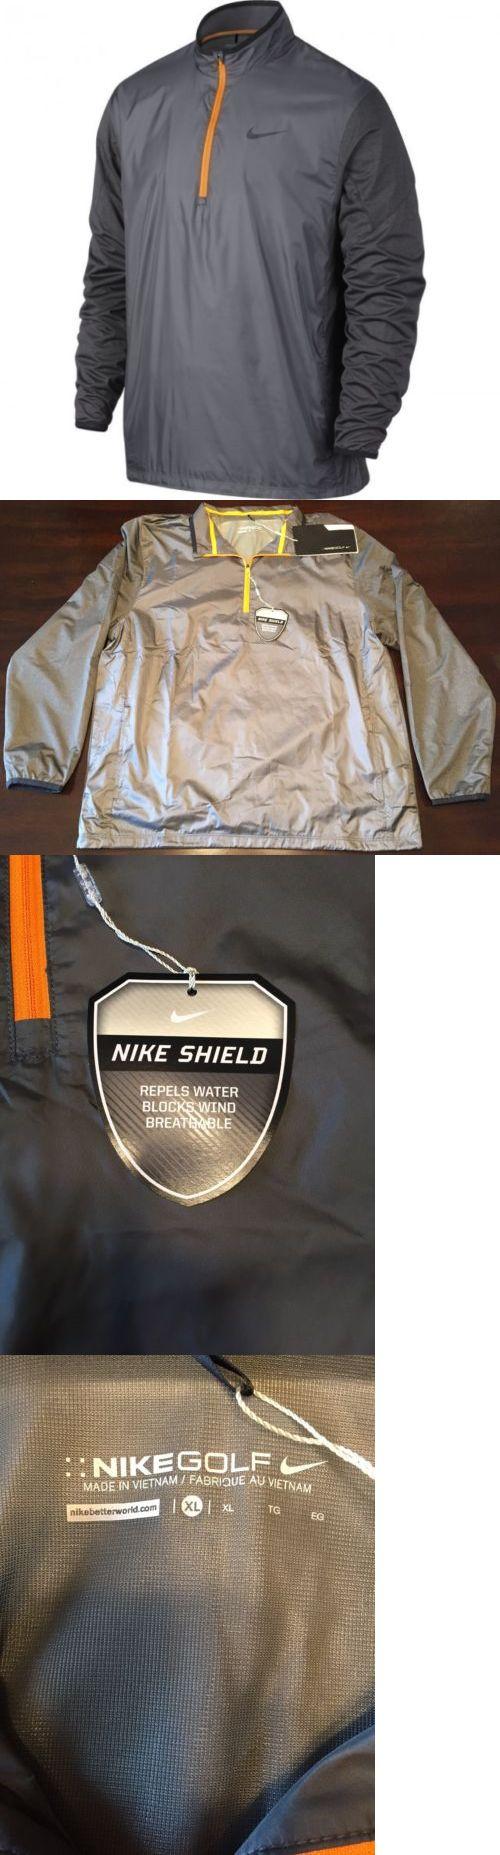 Coats and Jackets 181134: Nike Golf Men S 1 2 Zip Shield Top (Dark Grey Orange Black) Closeout Msrp:$85 -> BUY IT NOW ONLY: $34.99 on eBay!